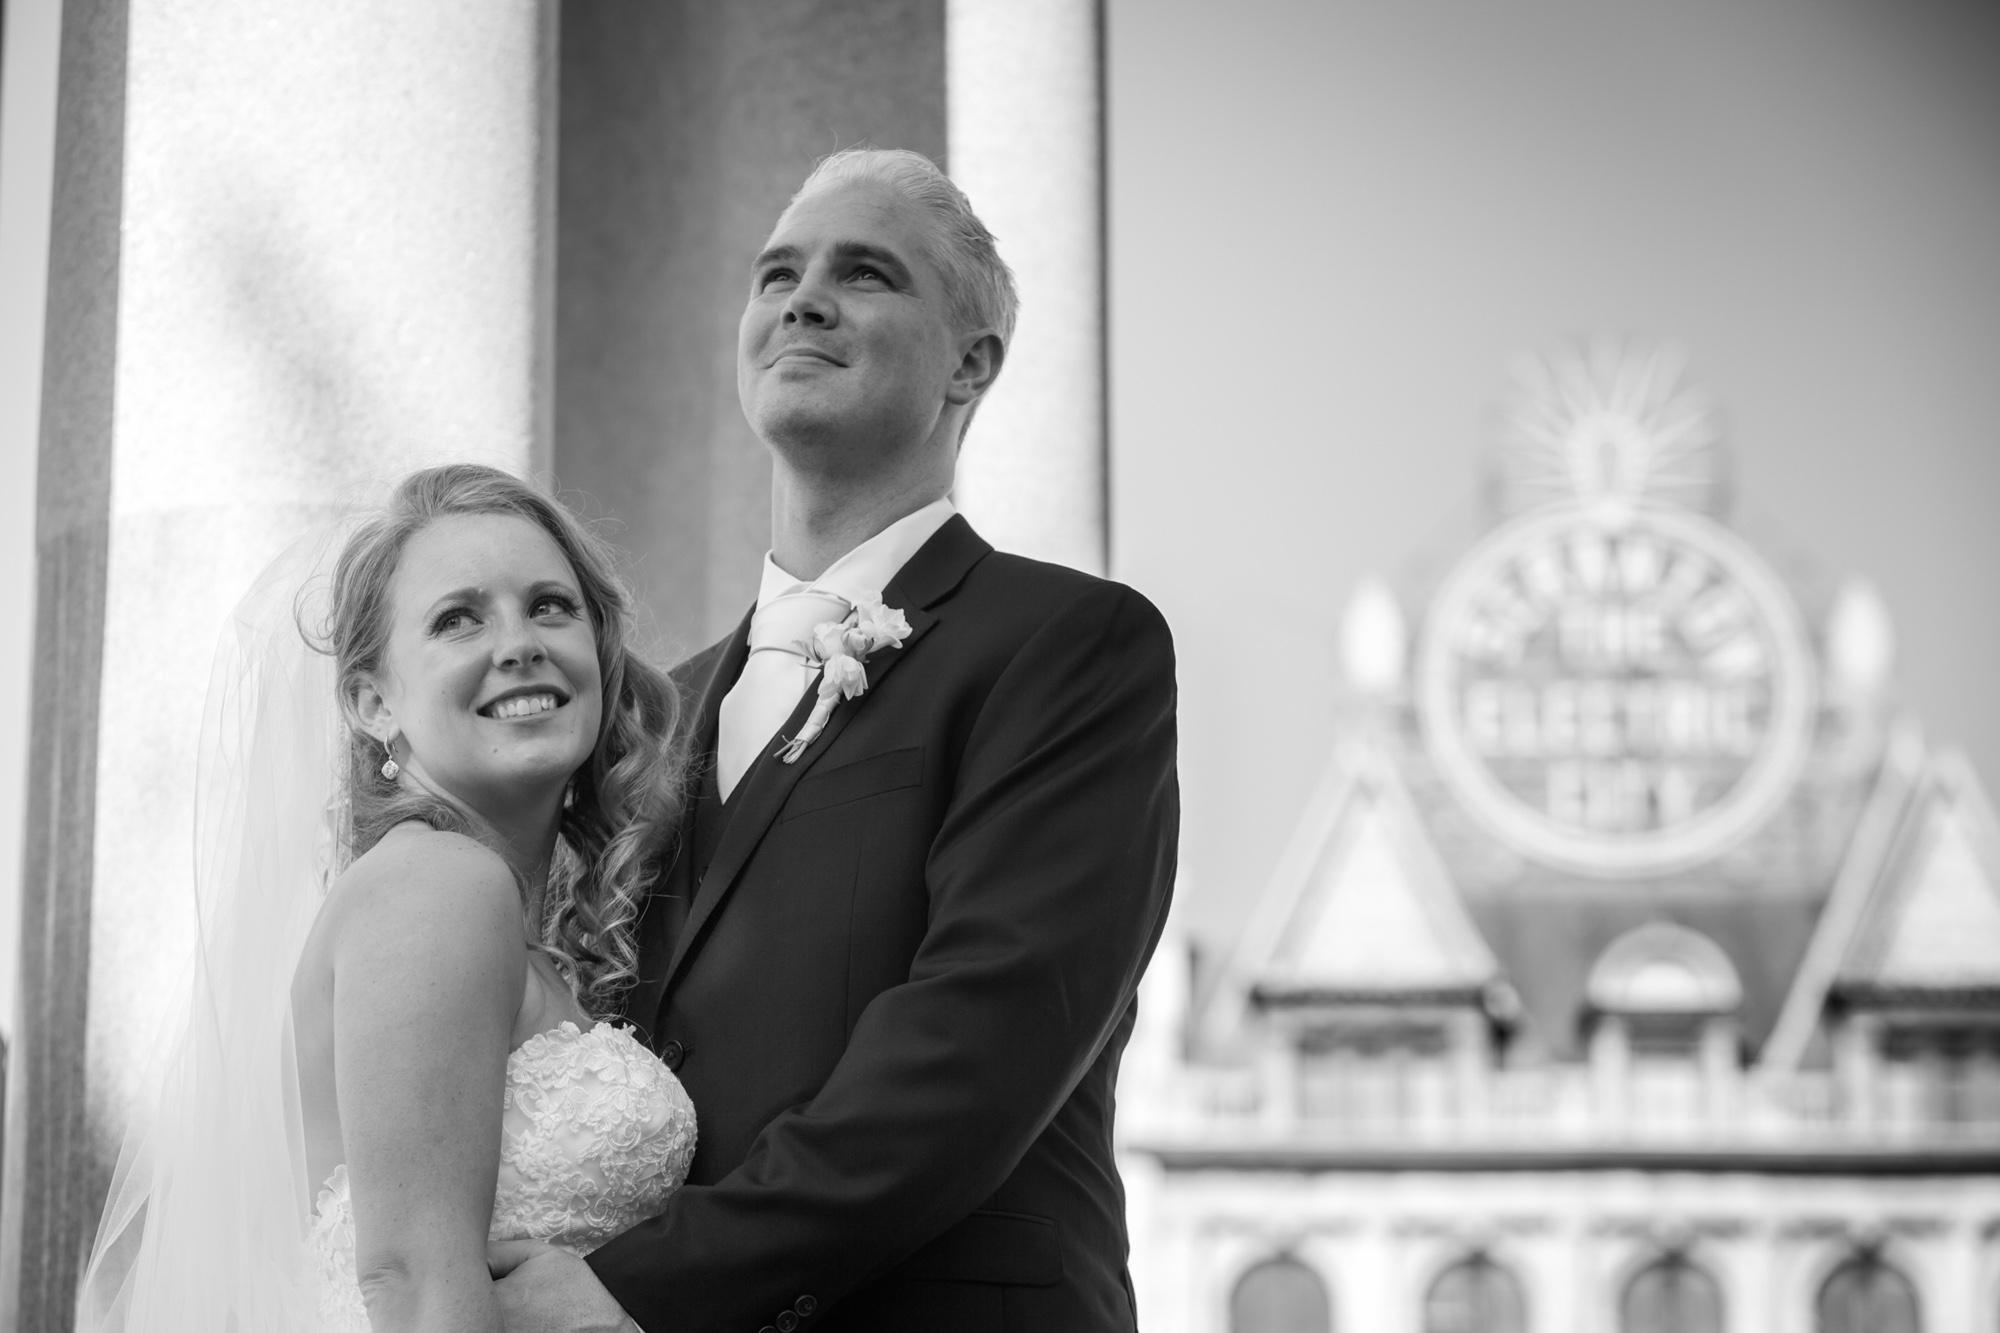 scranton_wedding_photographer_lettieri_pa (24 of 47).jpg